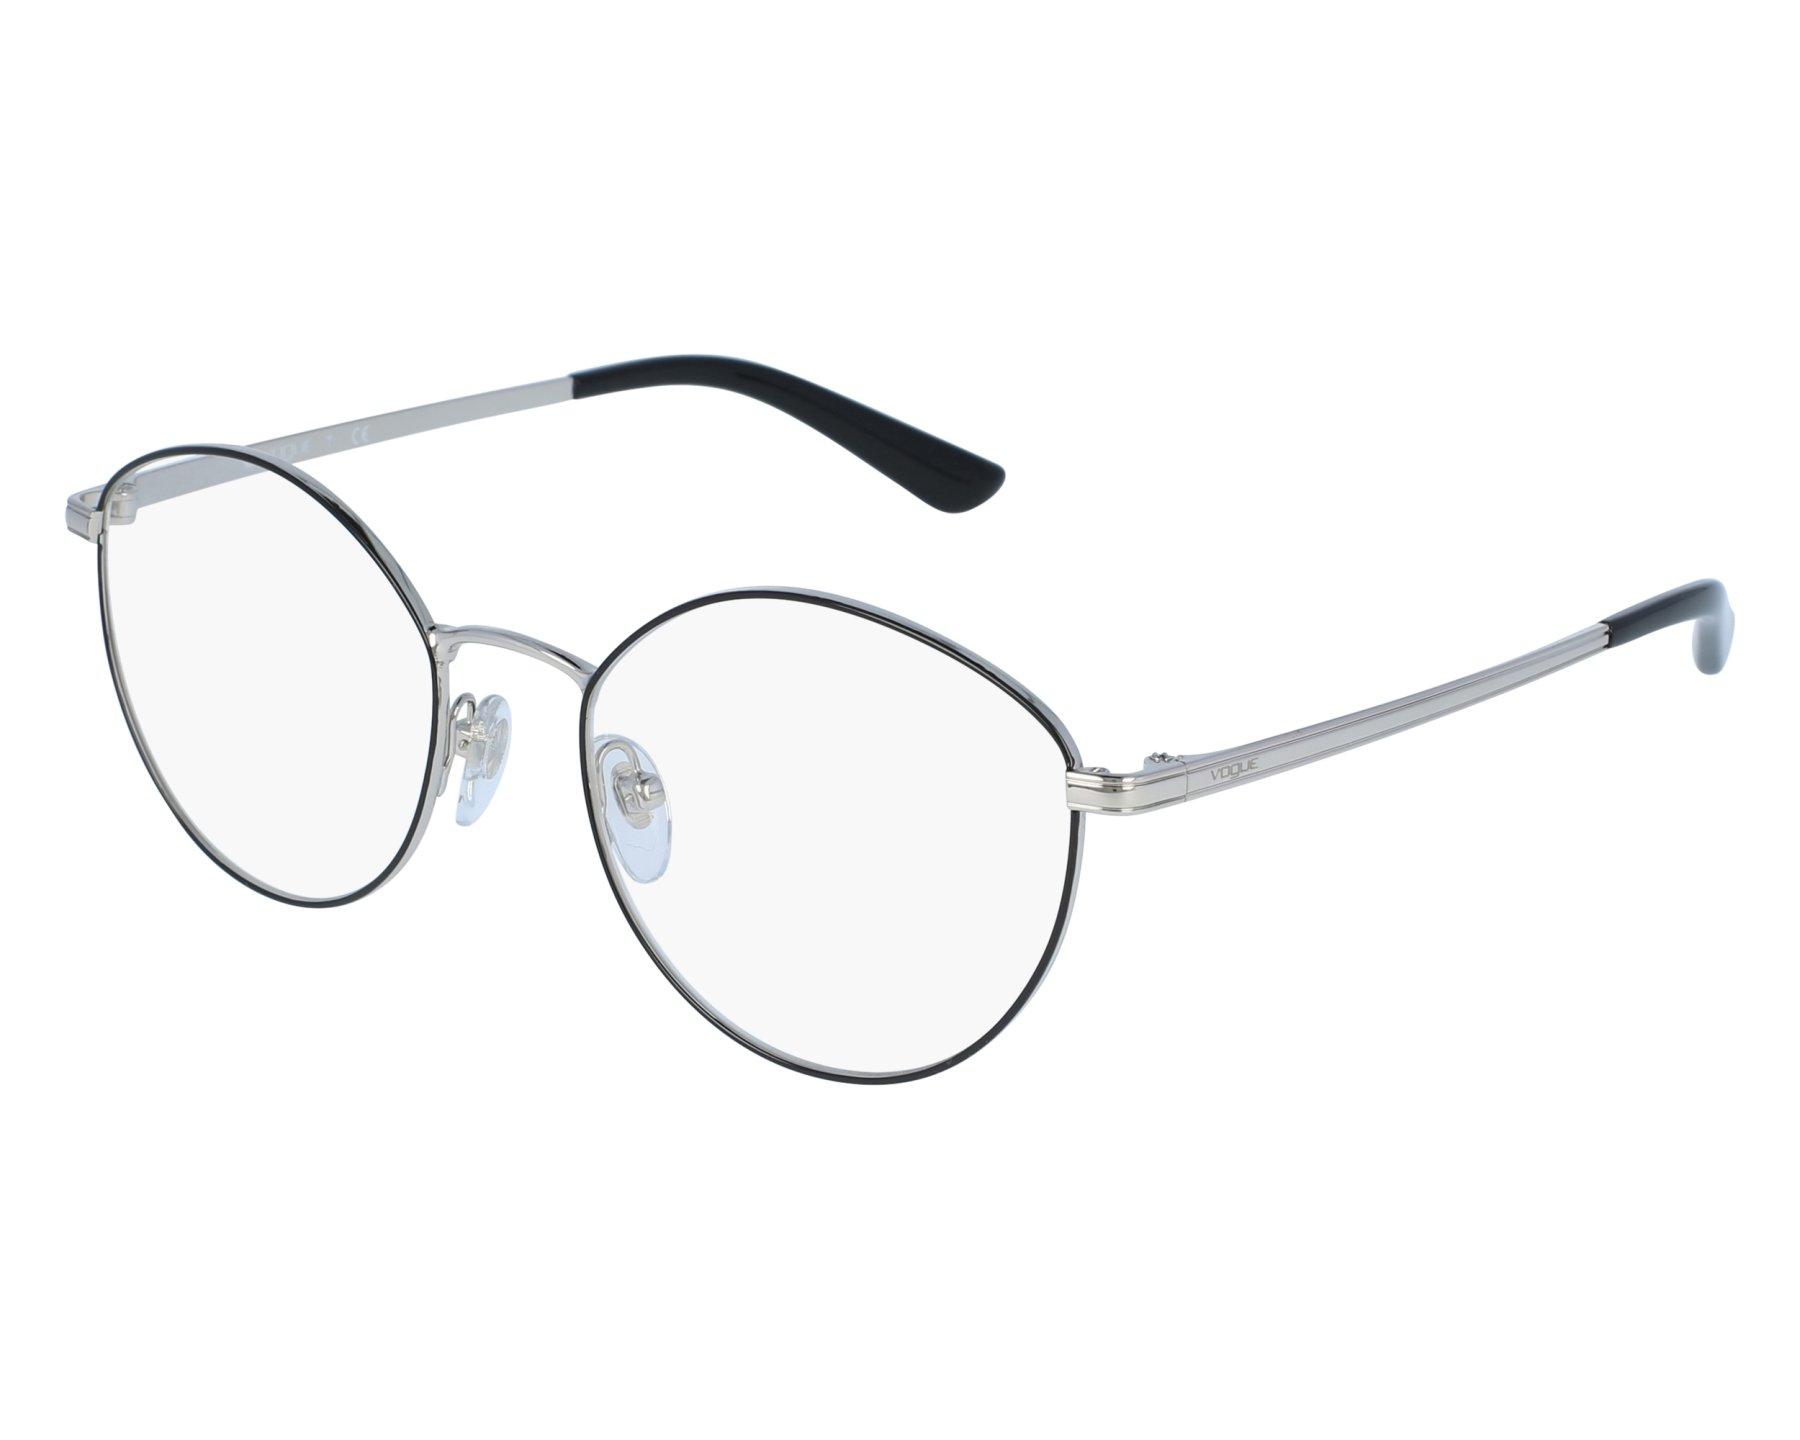 Vogue VO4025 Eyeglass Frames 352-51 Black//Silver